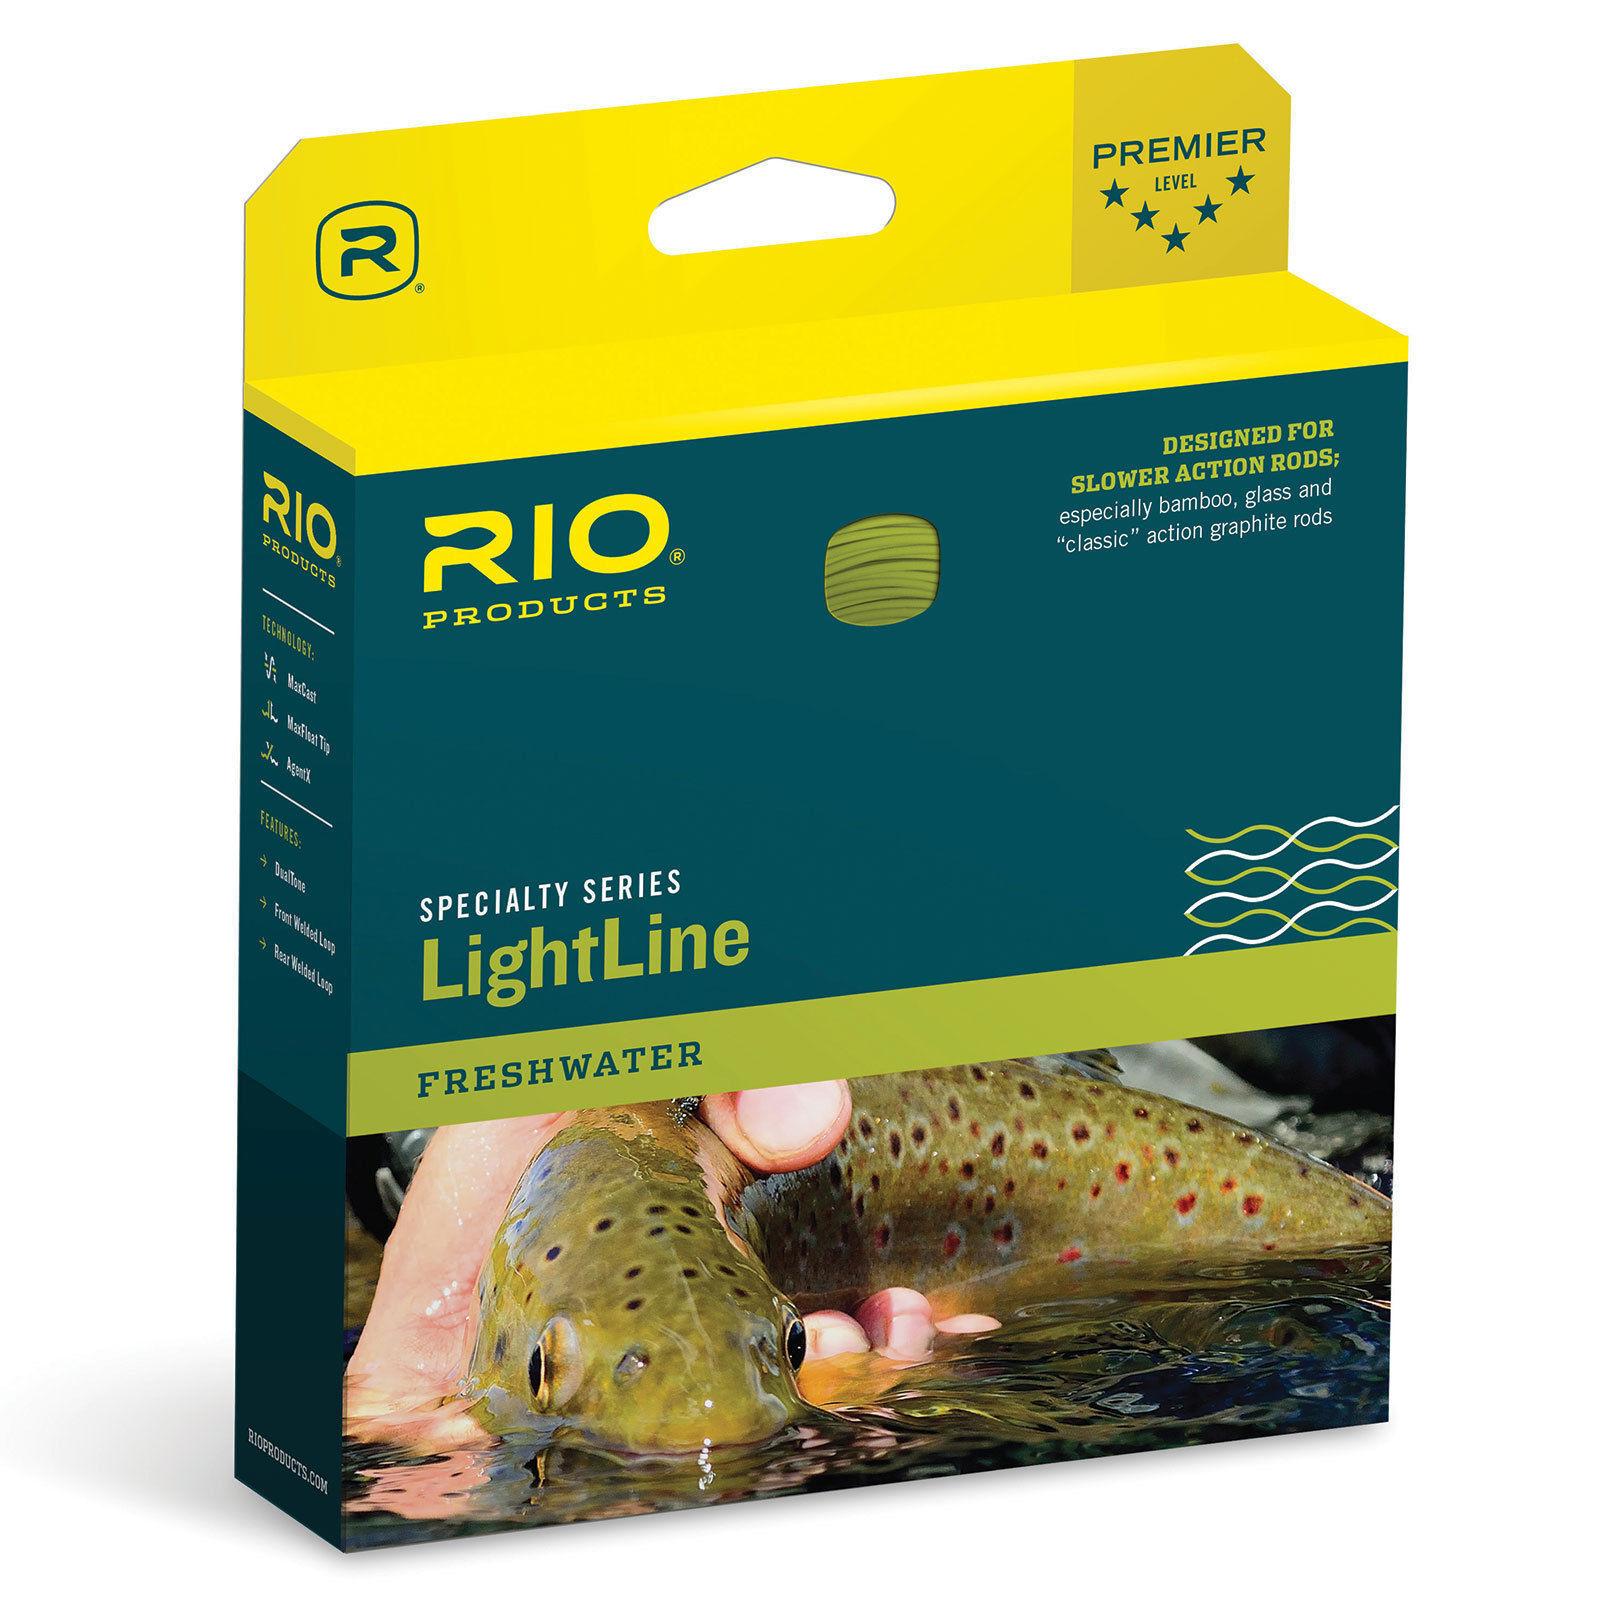 NEW RIO LIGHTLINE DT-1-F  1 DOUBLE TAPER FLOATING Fliegen LINE FOR BAMBOO, GLASS ROD